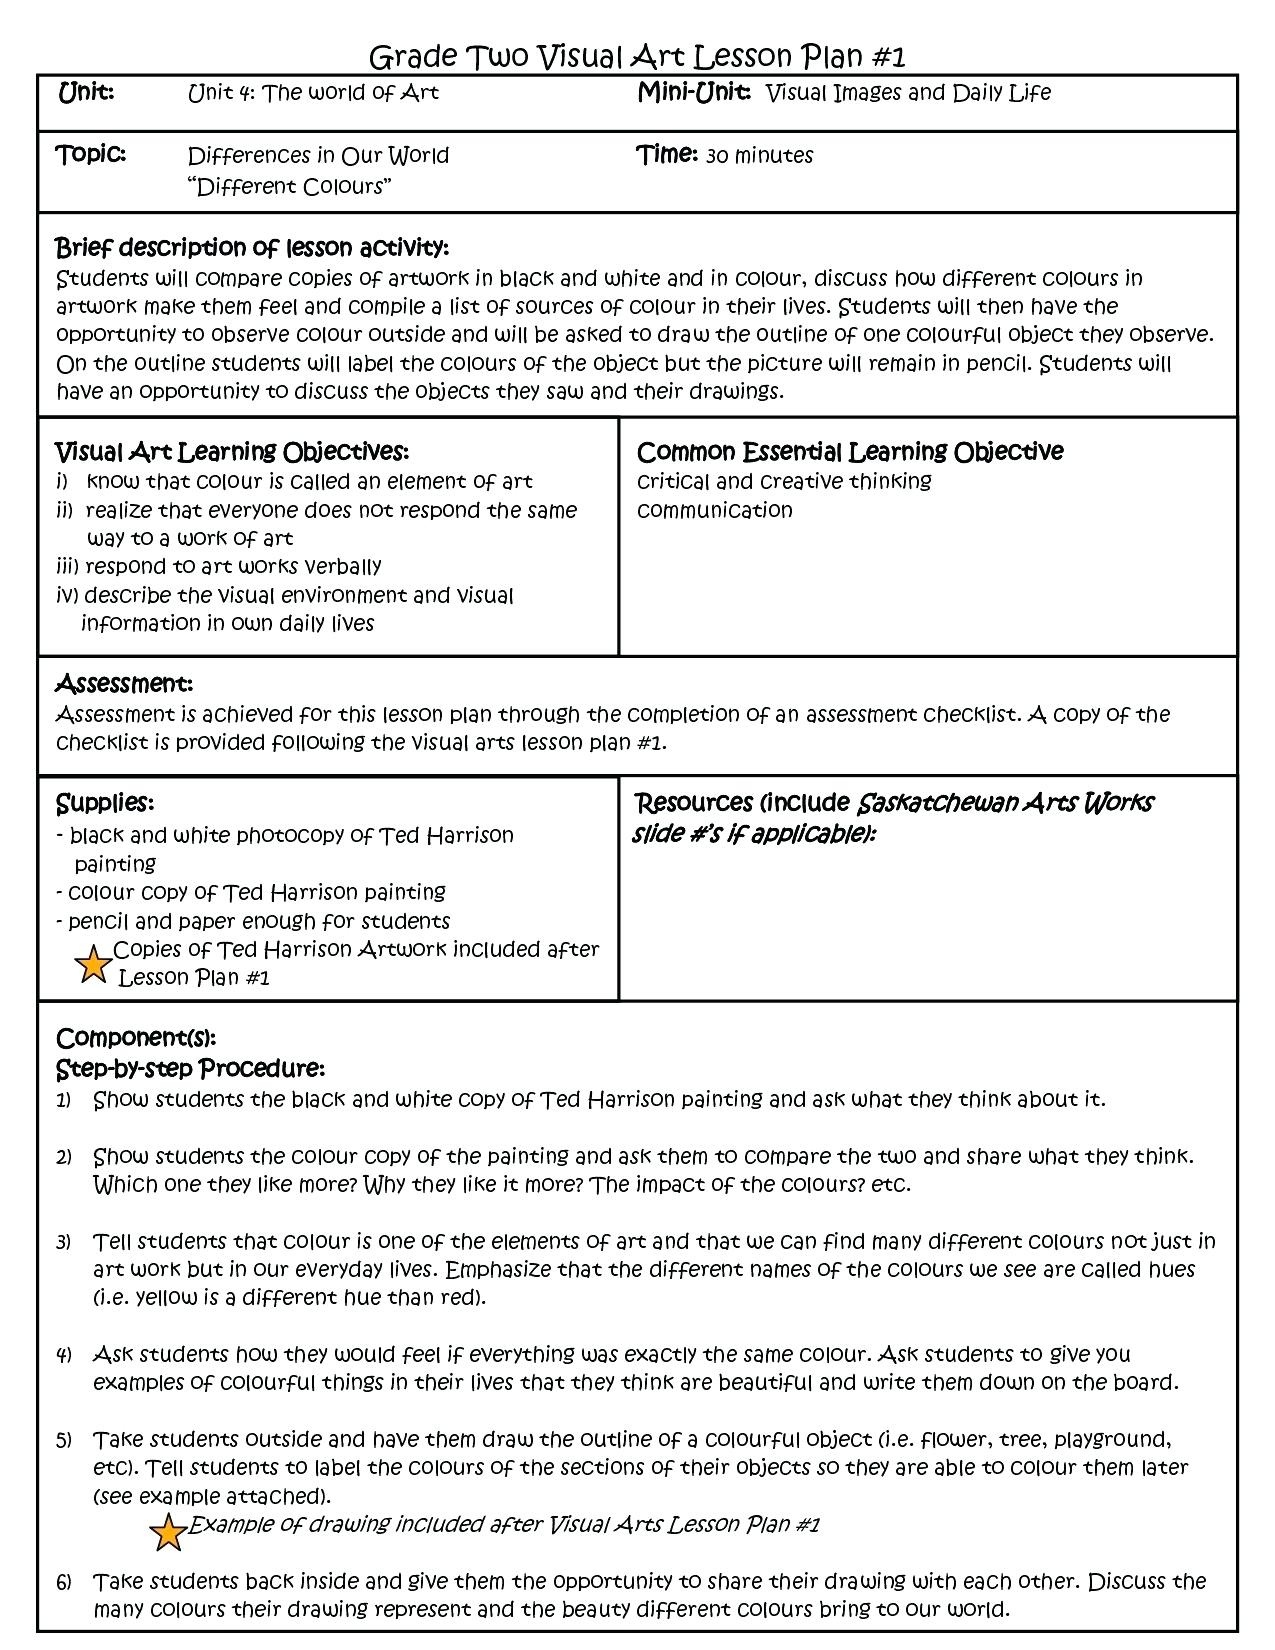 029 Pre K Assessment Forms Gallery Of Doe Lessonn Template - Free Printable Pre K Assessment Forms